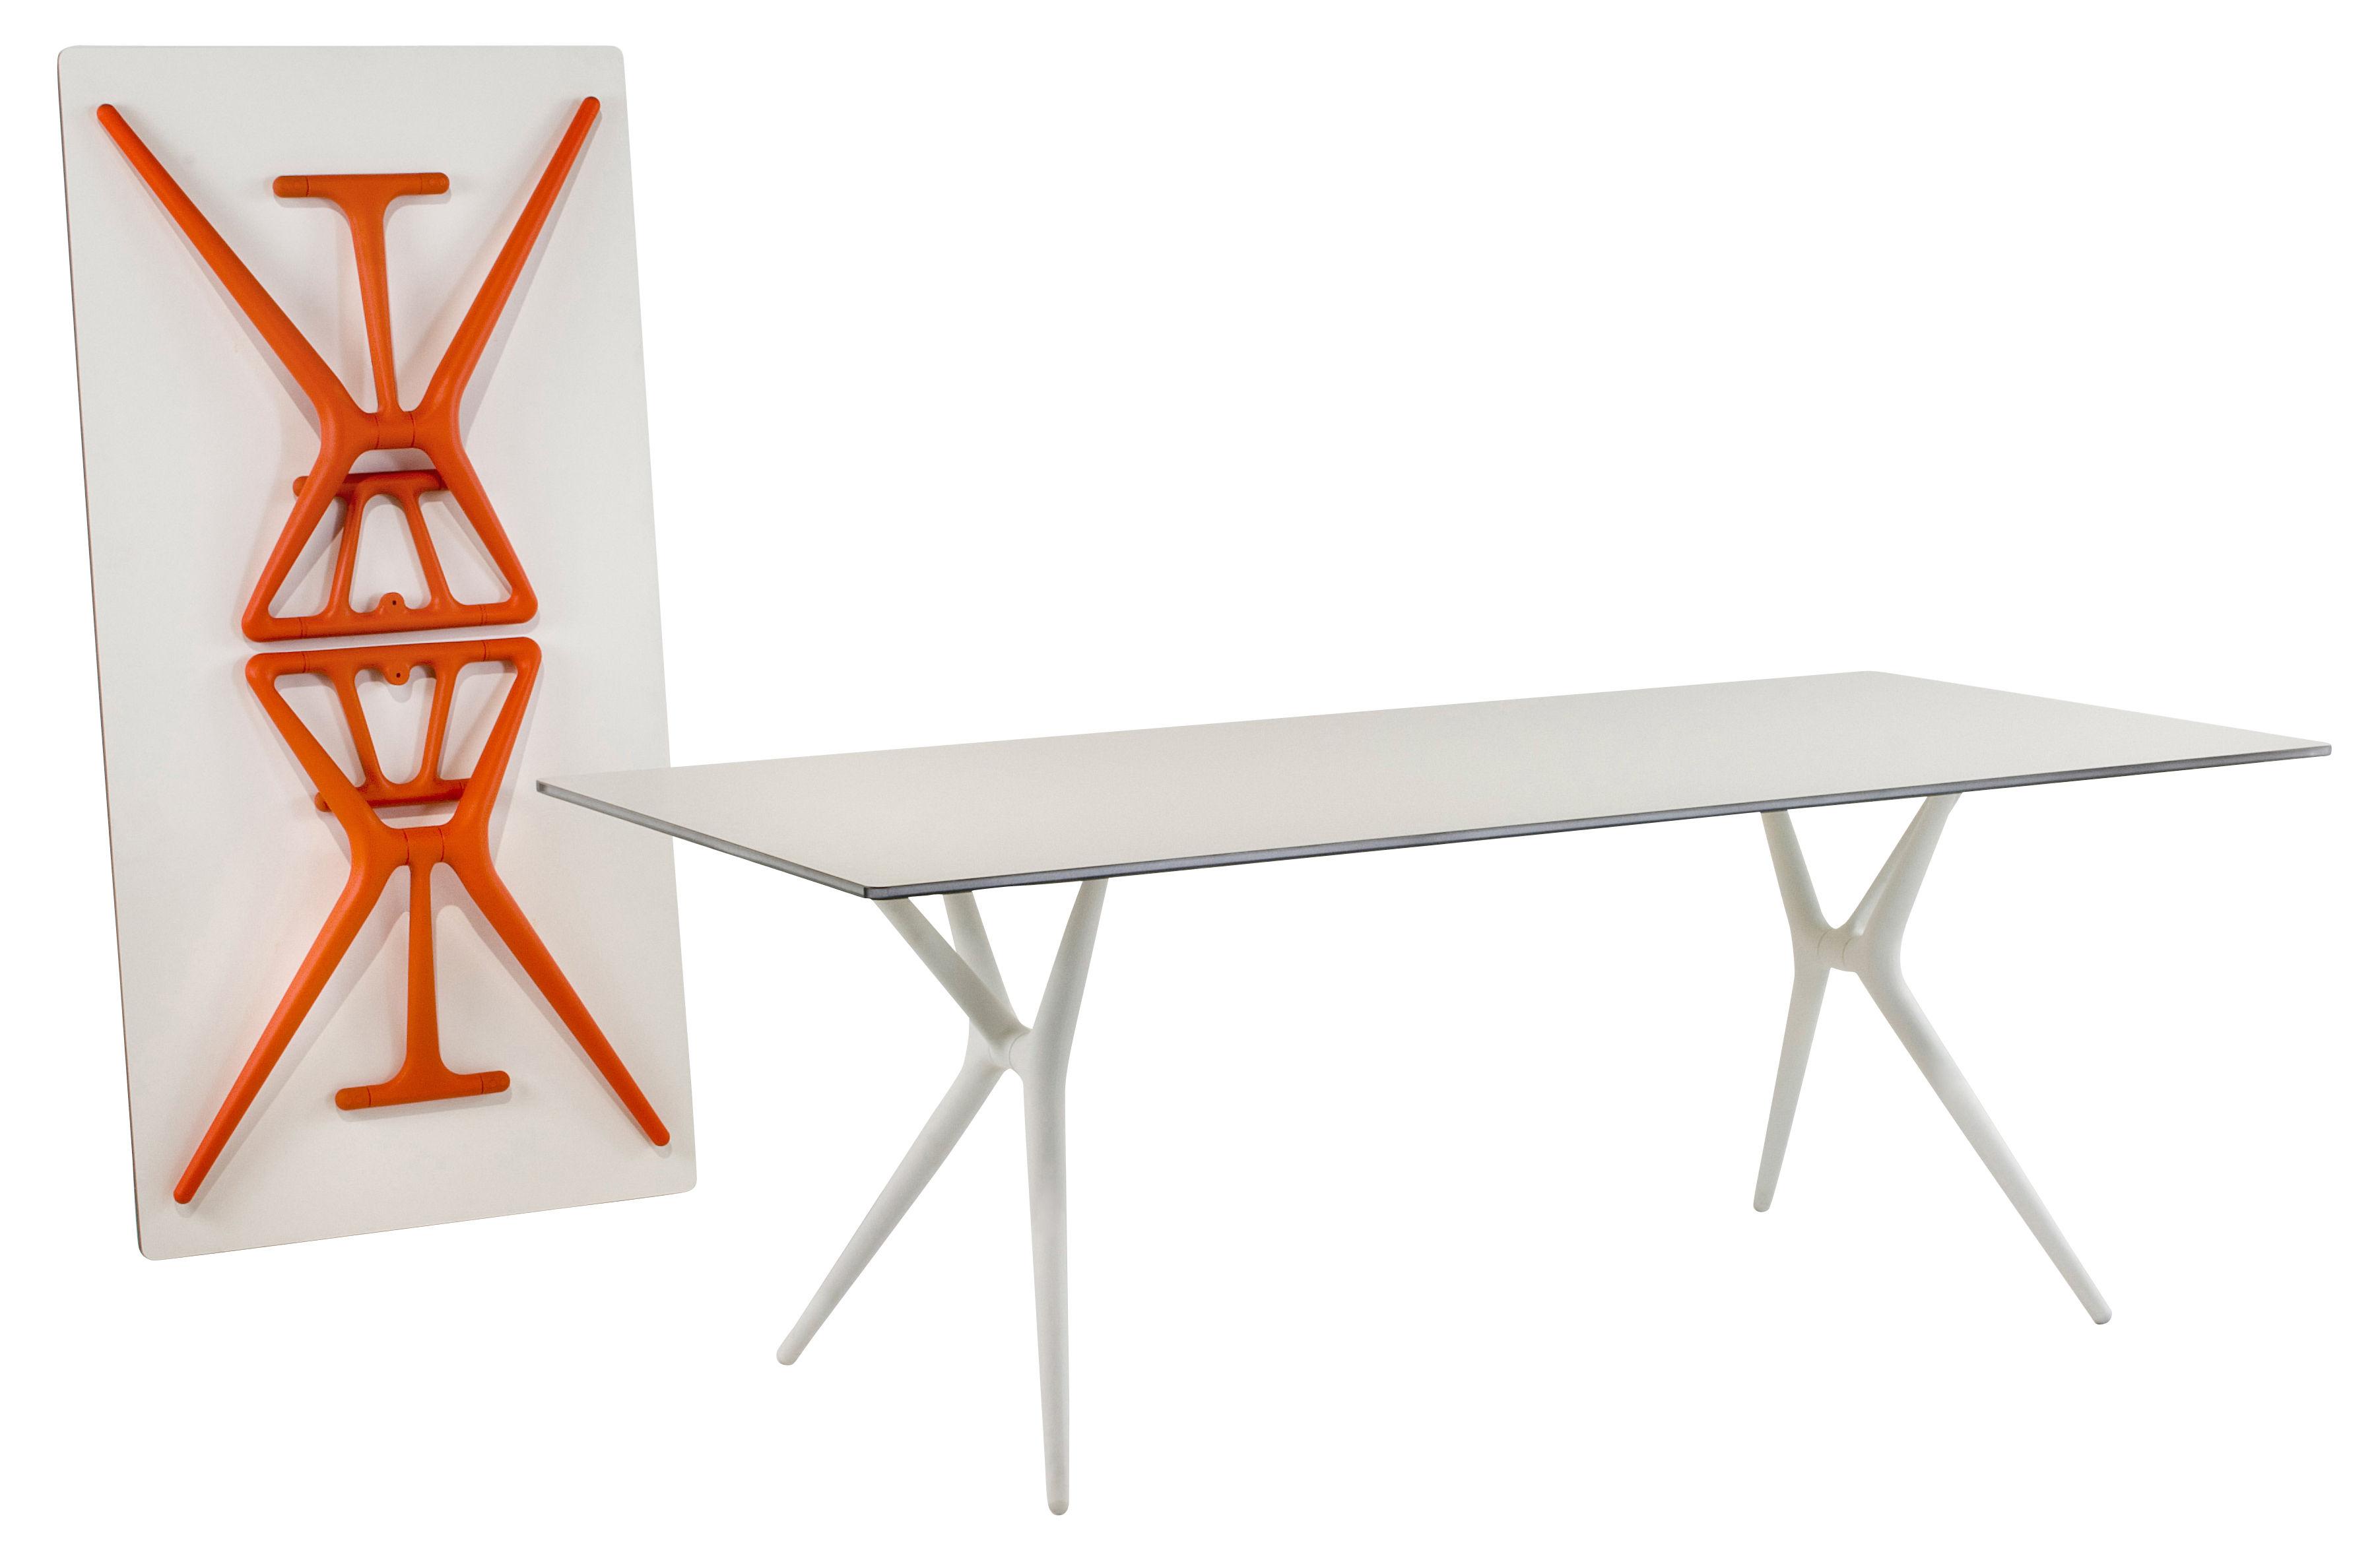 Spoon foldable table 160 x 80 cm white orange feet by for Tavolo pieghevole design